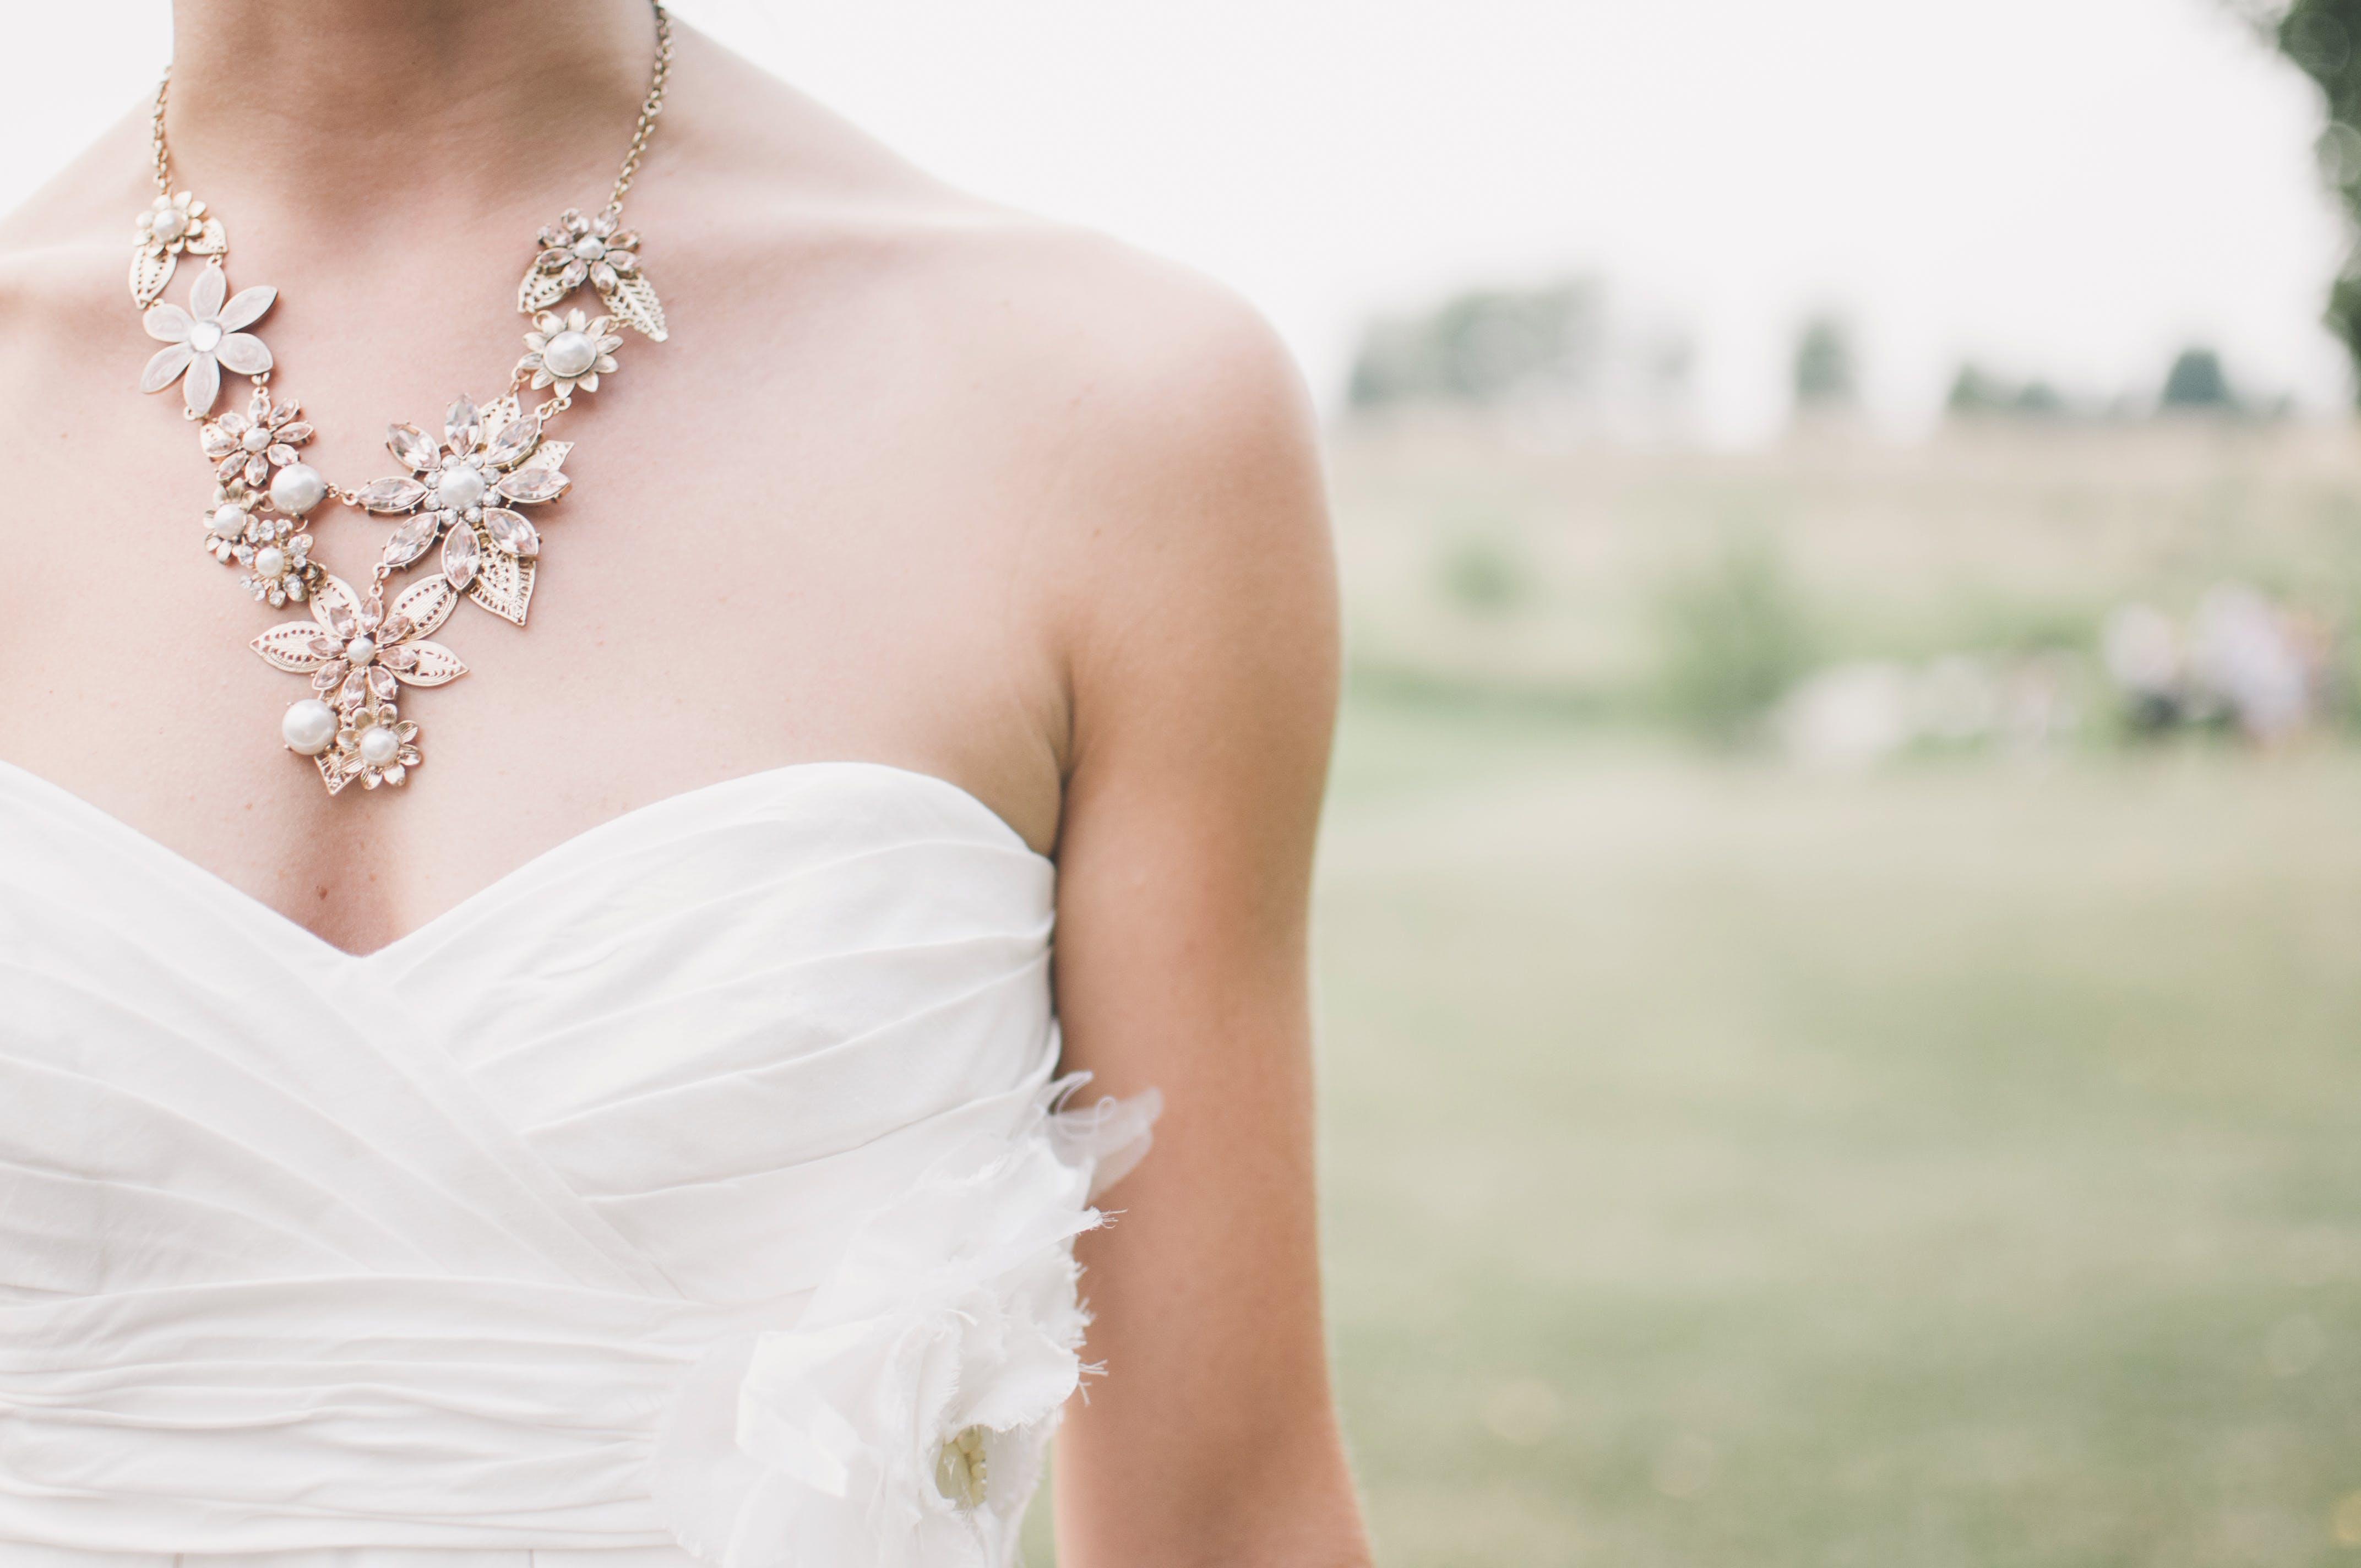 brudekjole, halskæde, hvid kjole